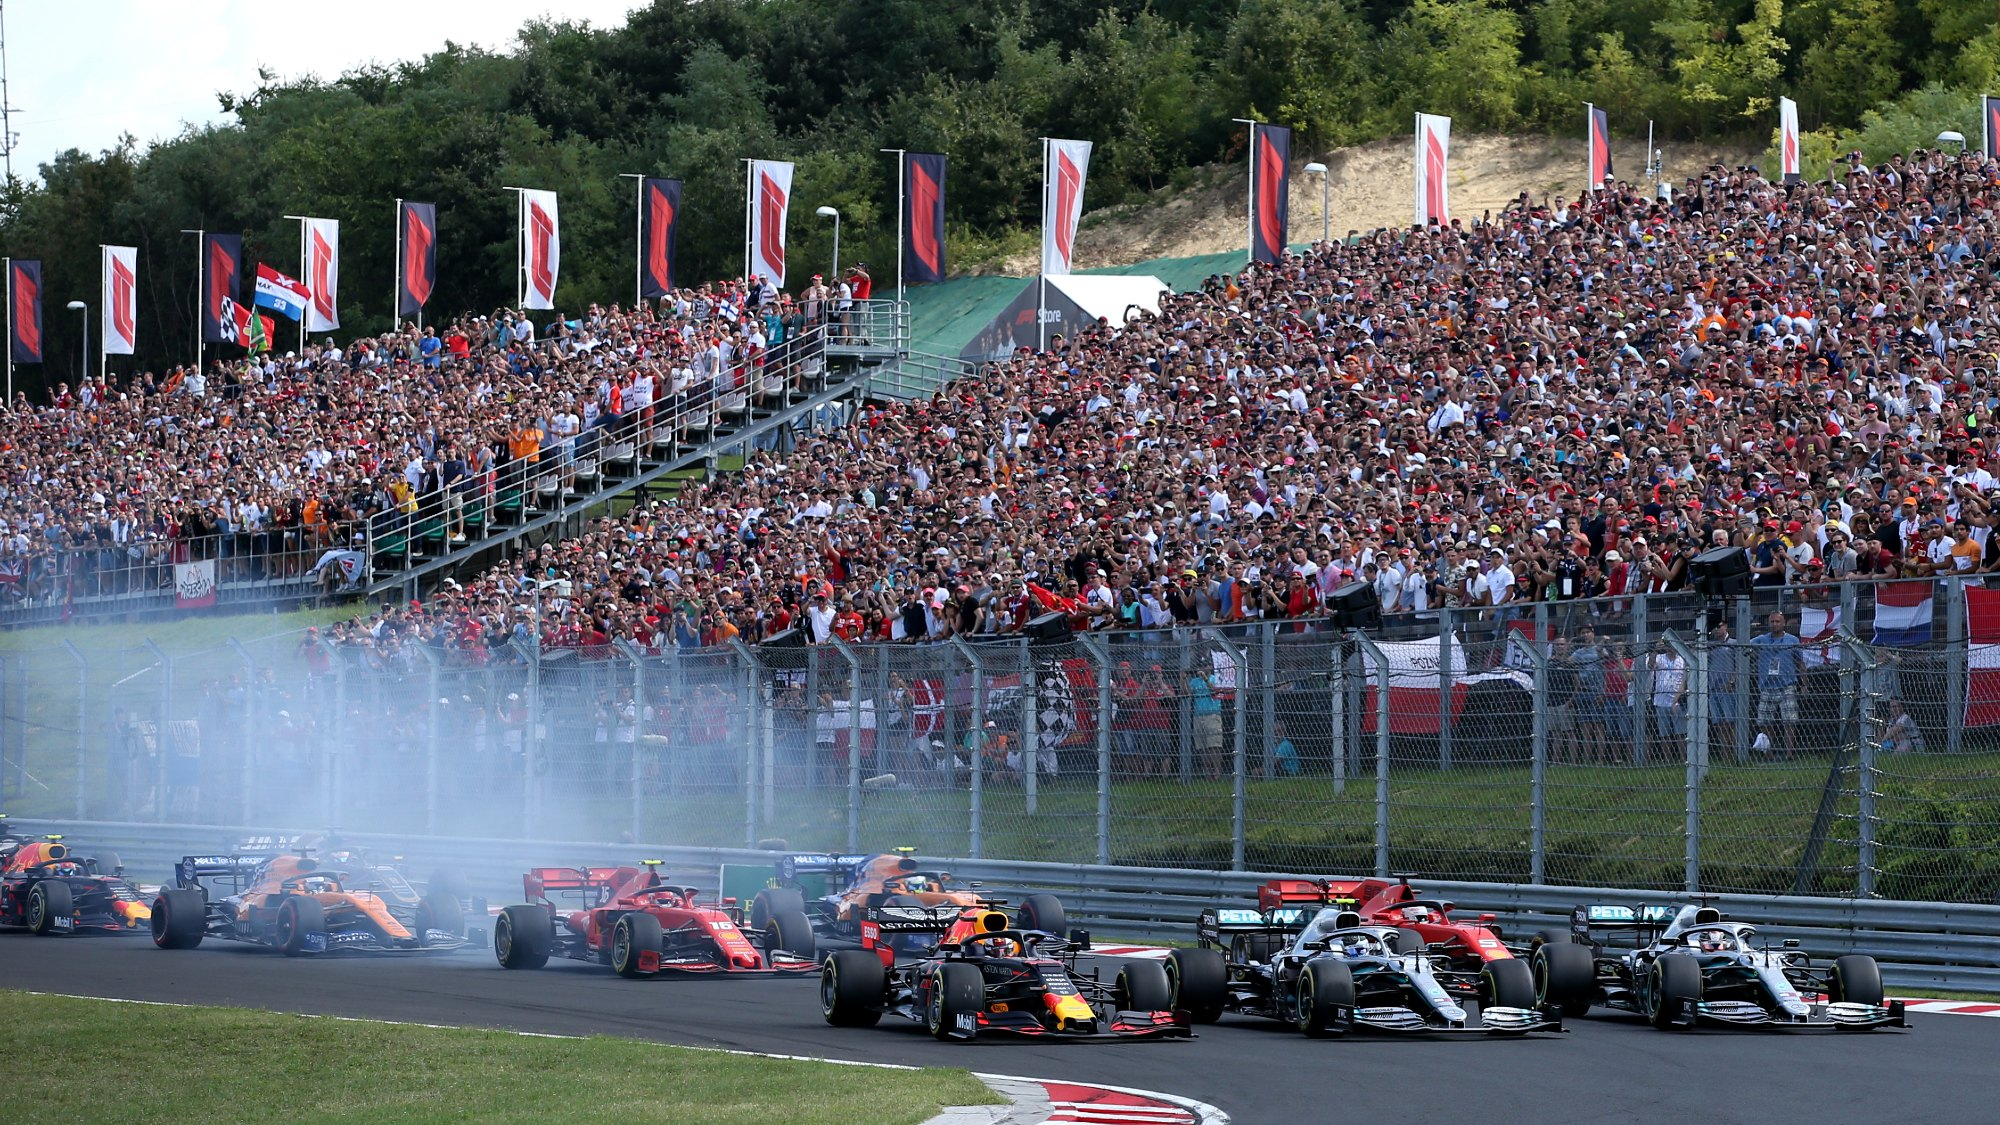 Start of the 2019 Hungarian GP